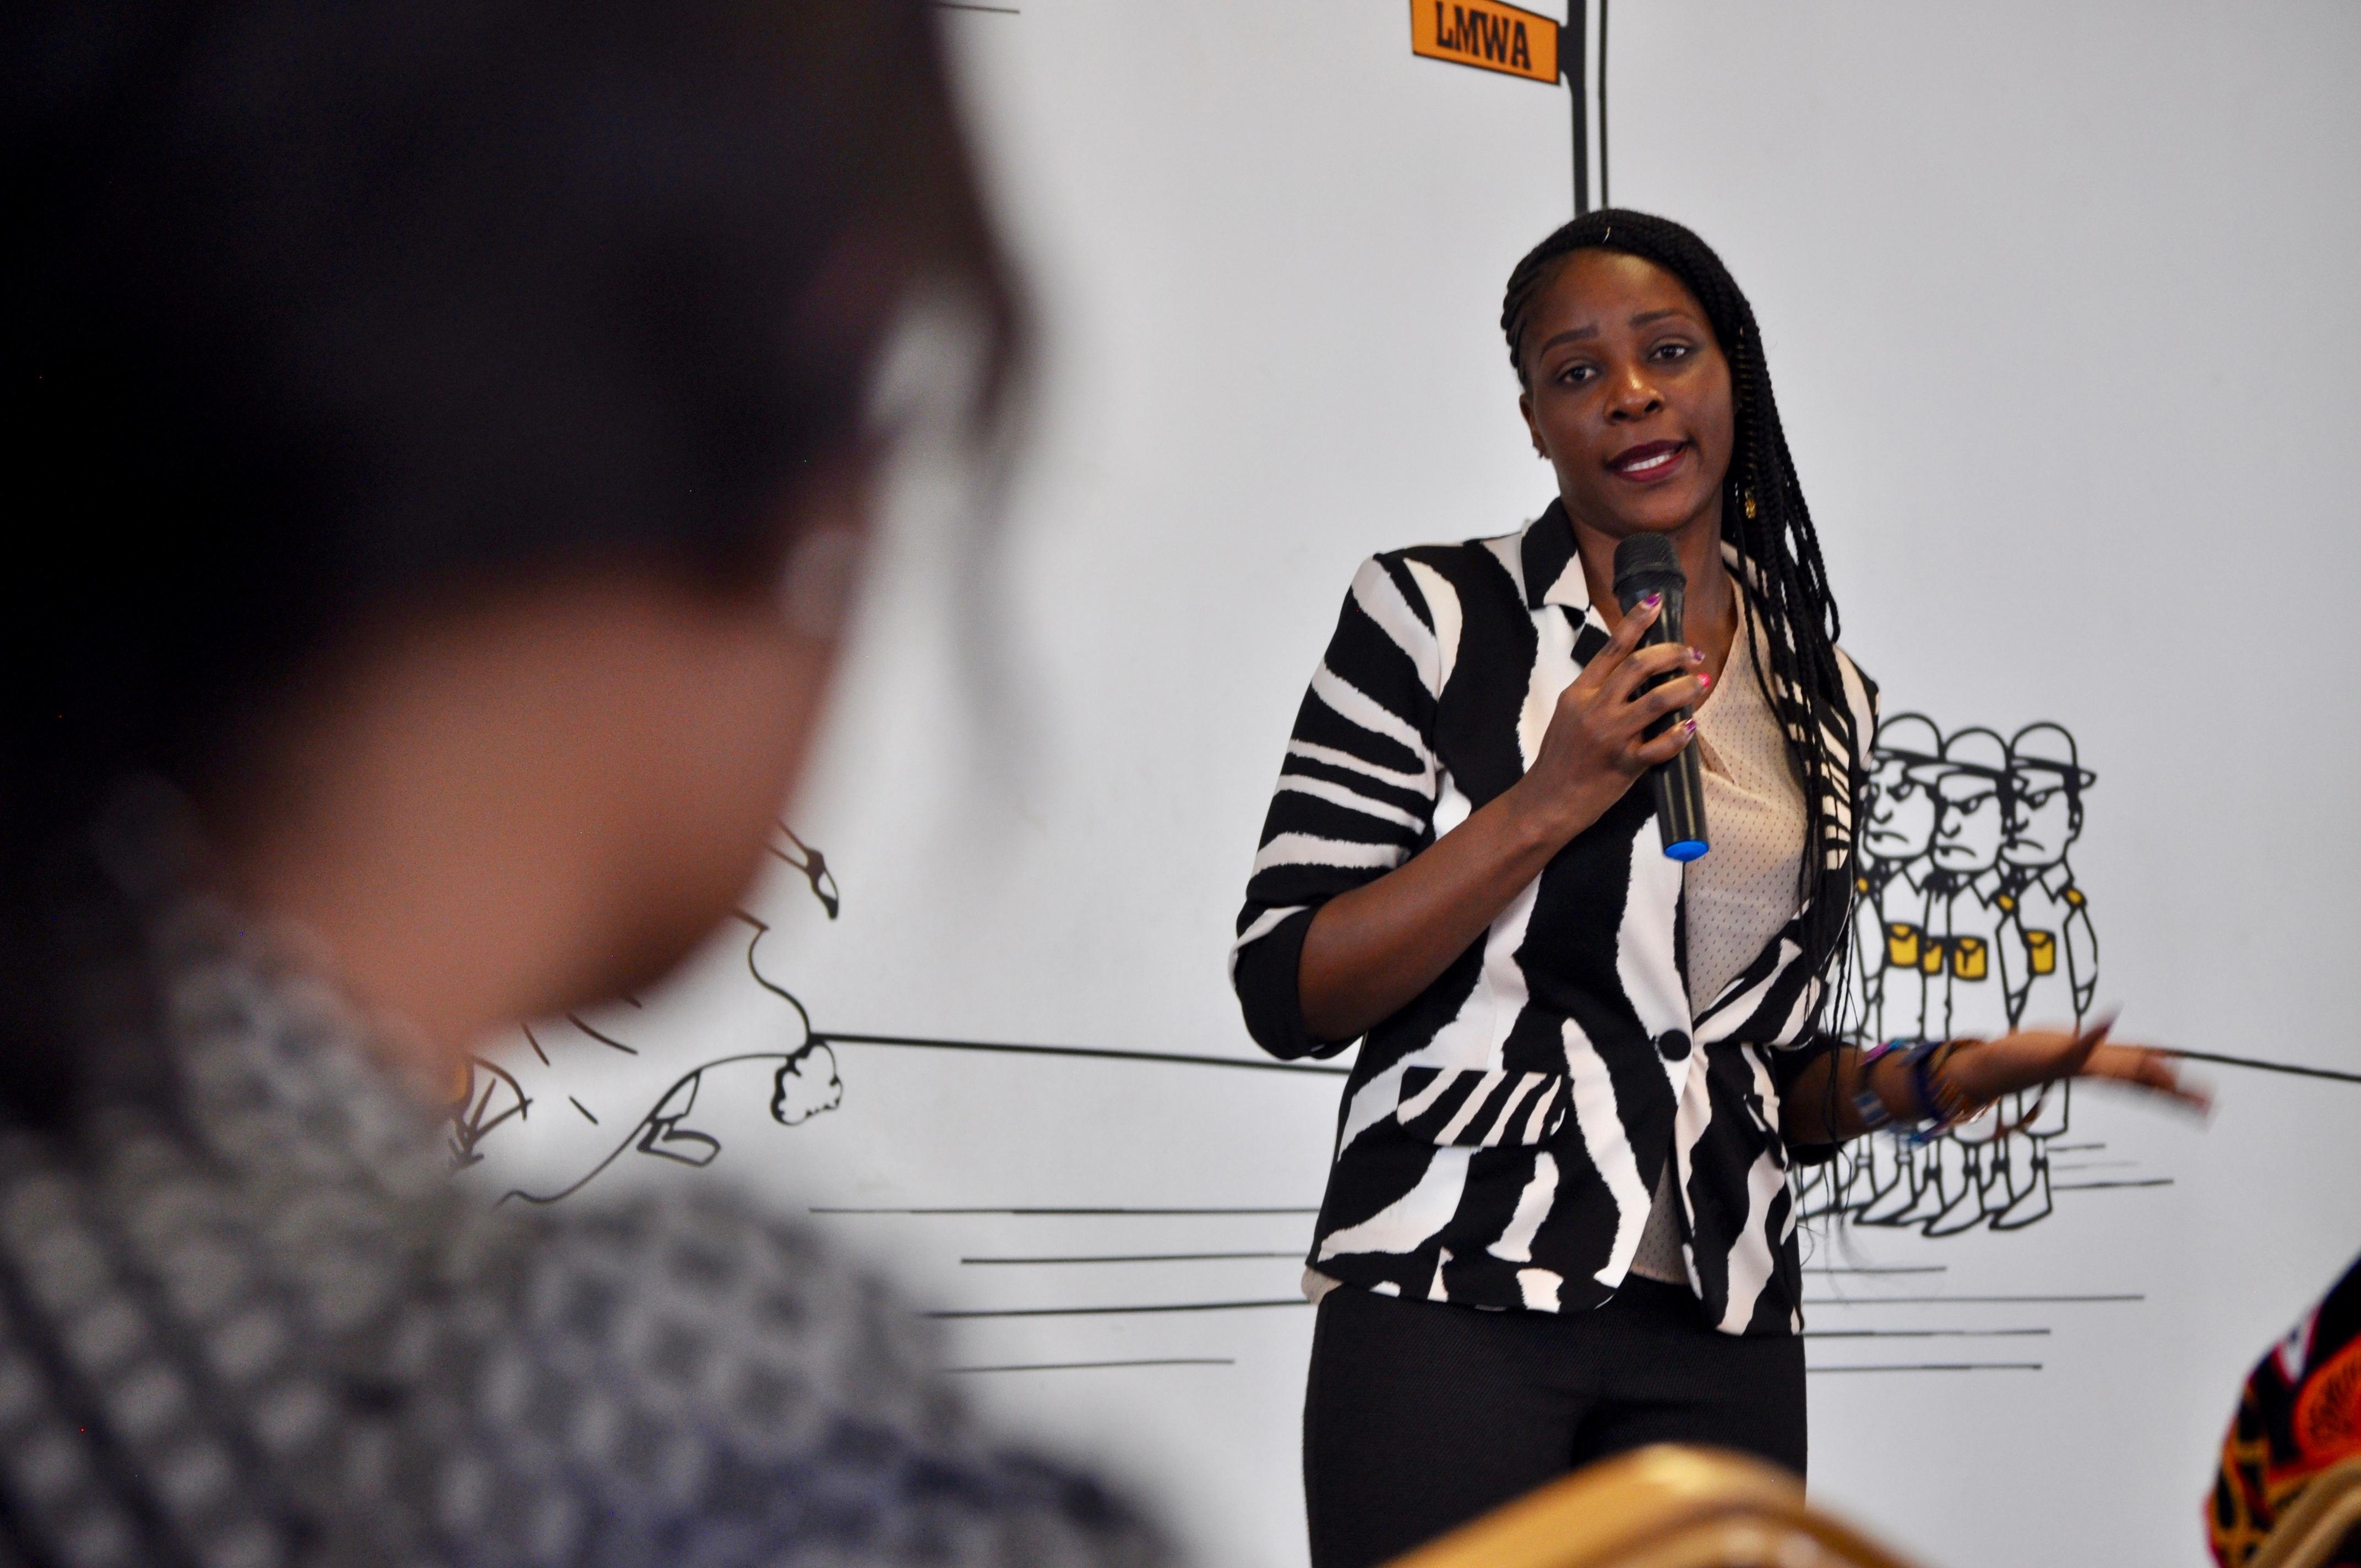 Joan Nandiri describes the plight of widows facing land corruption in Kenya